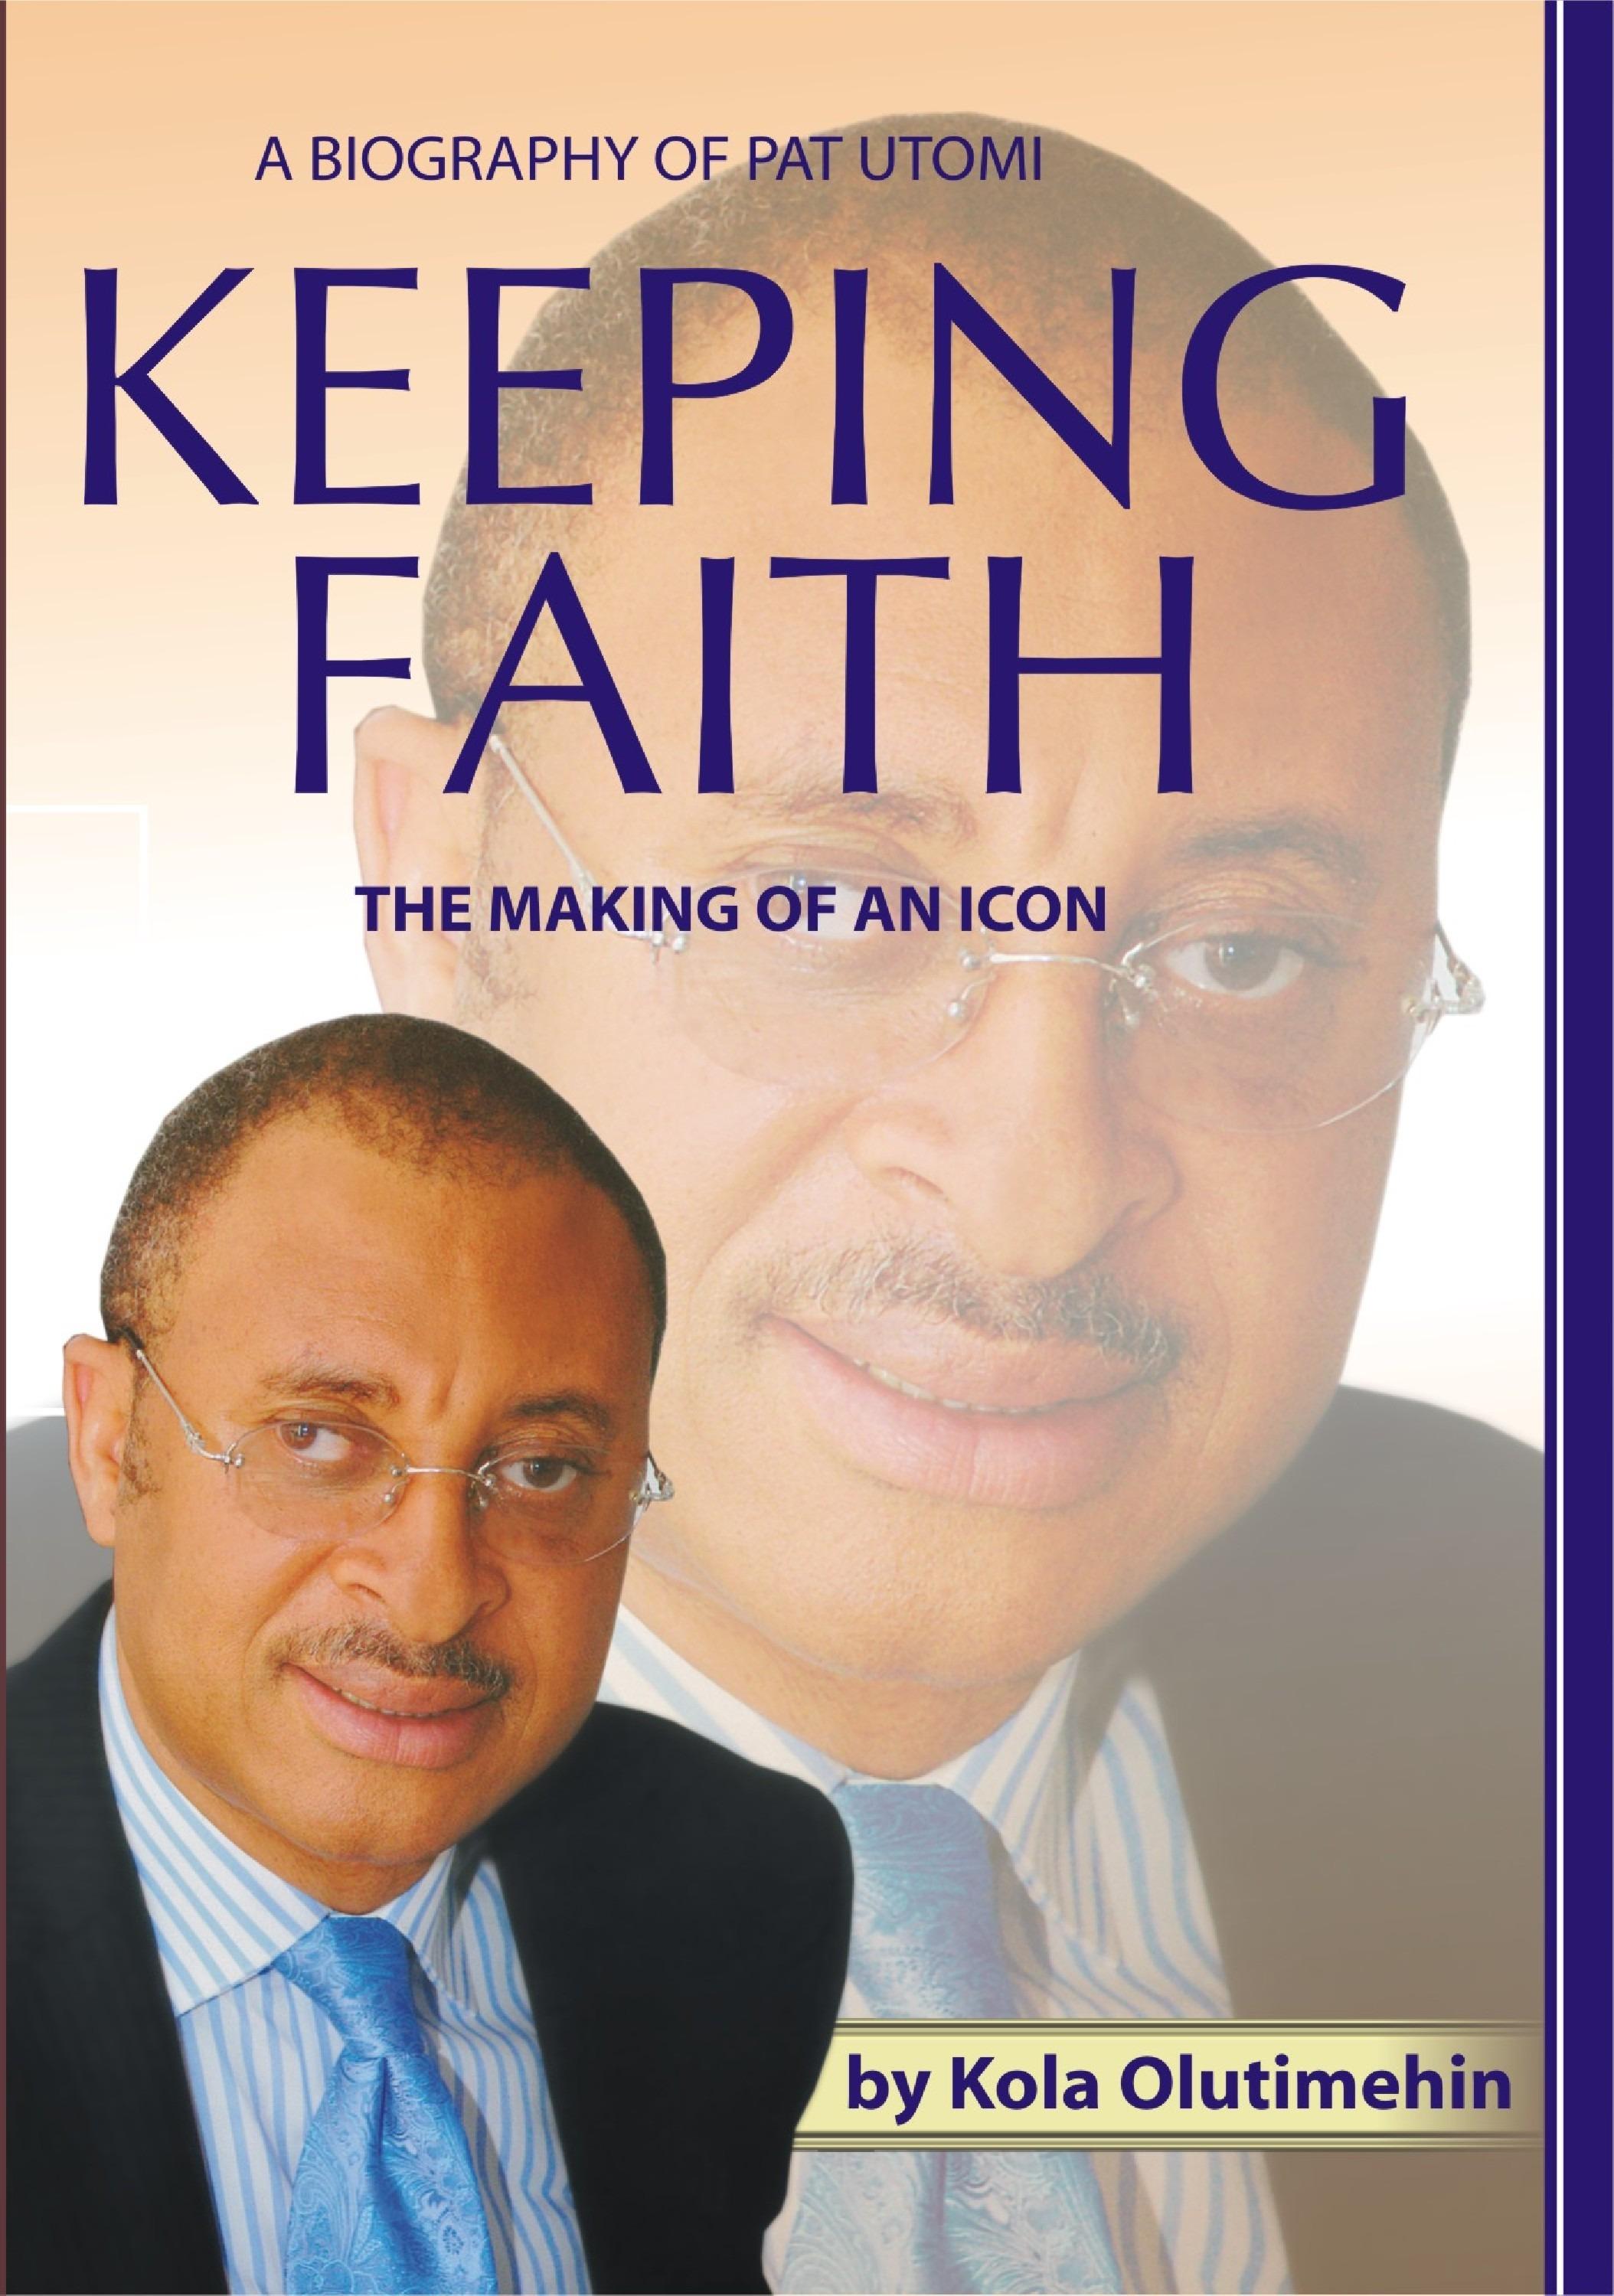 BIOGRAPHY OF PAT UTOMI - KEEPING FAITH